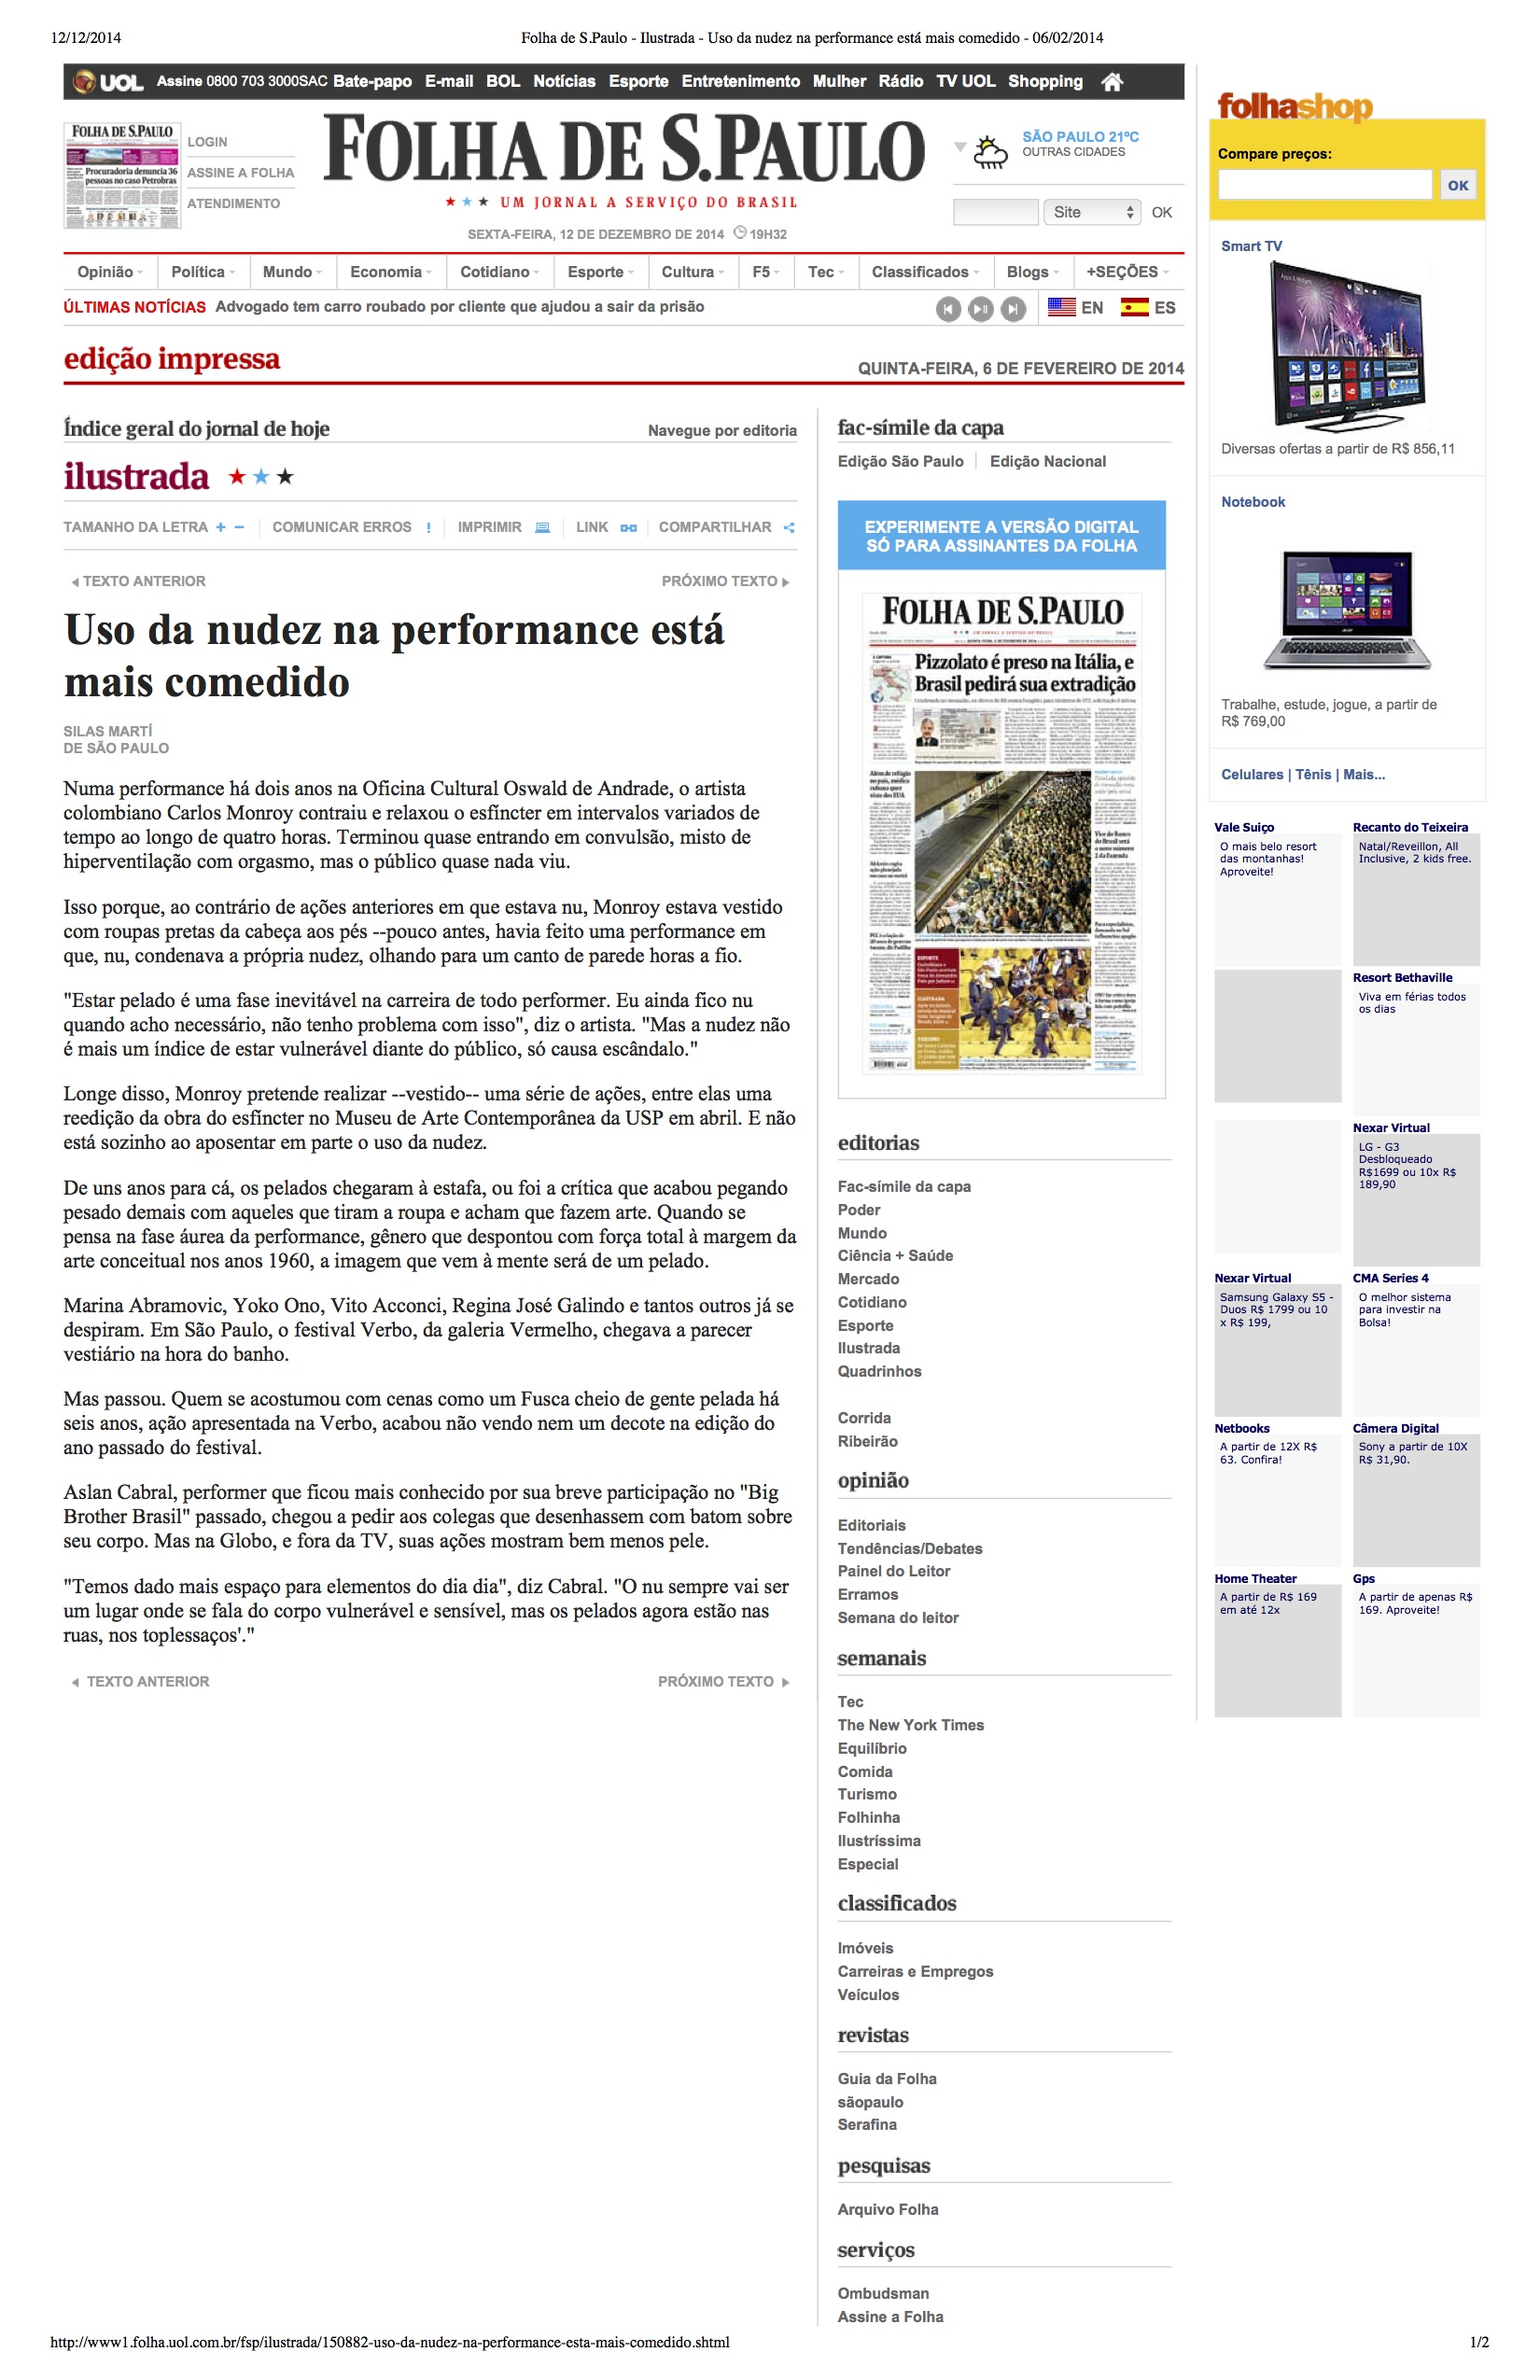 Folha de S.jpg